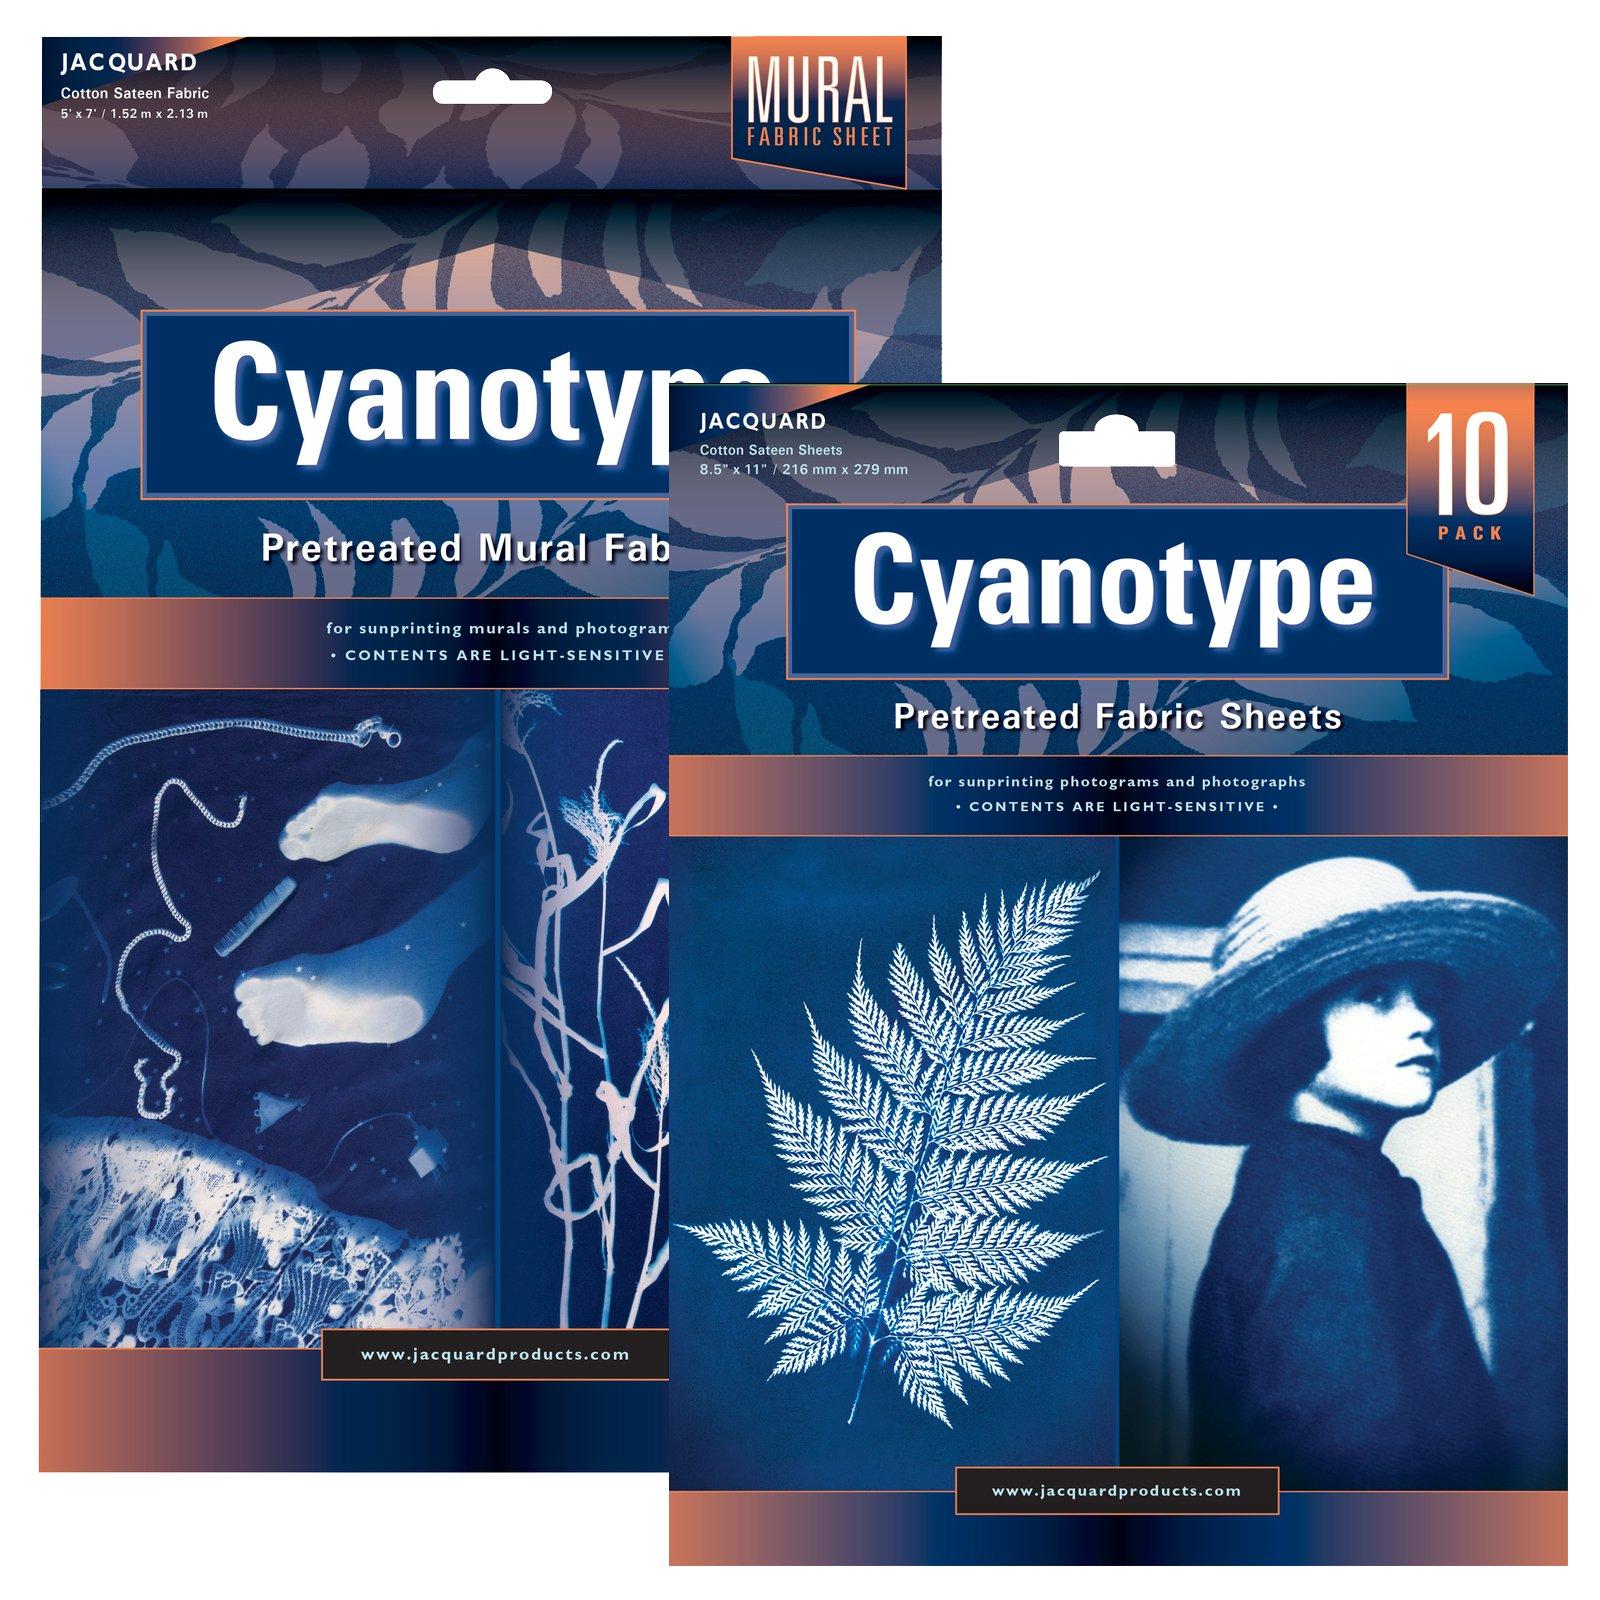 Cyanotype Fabric